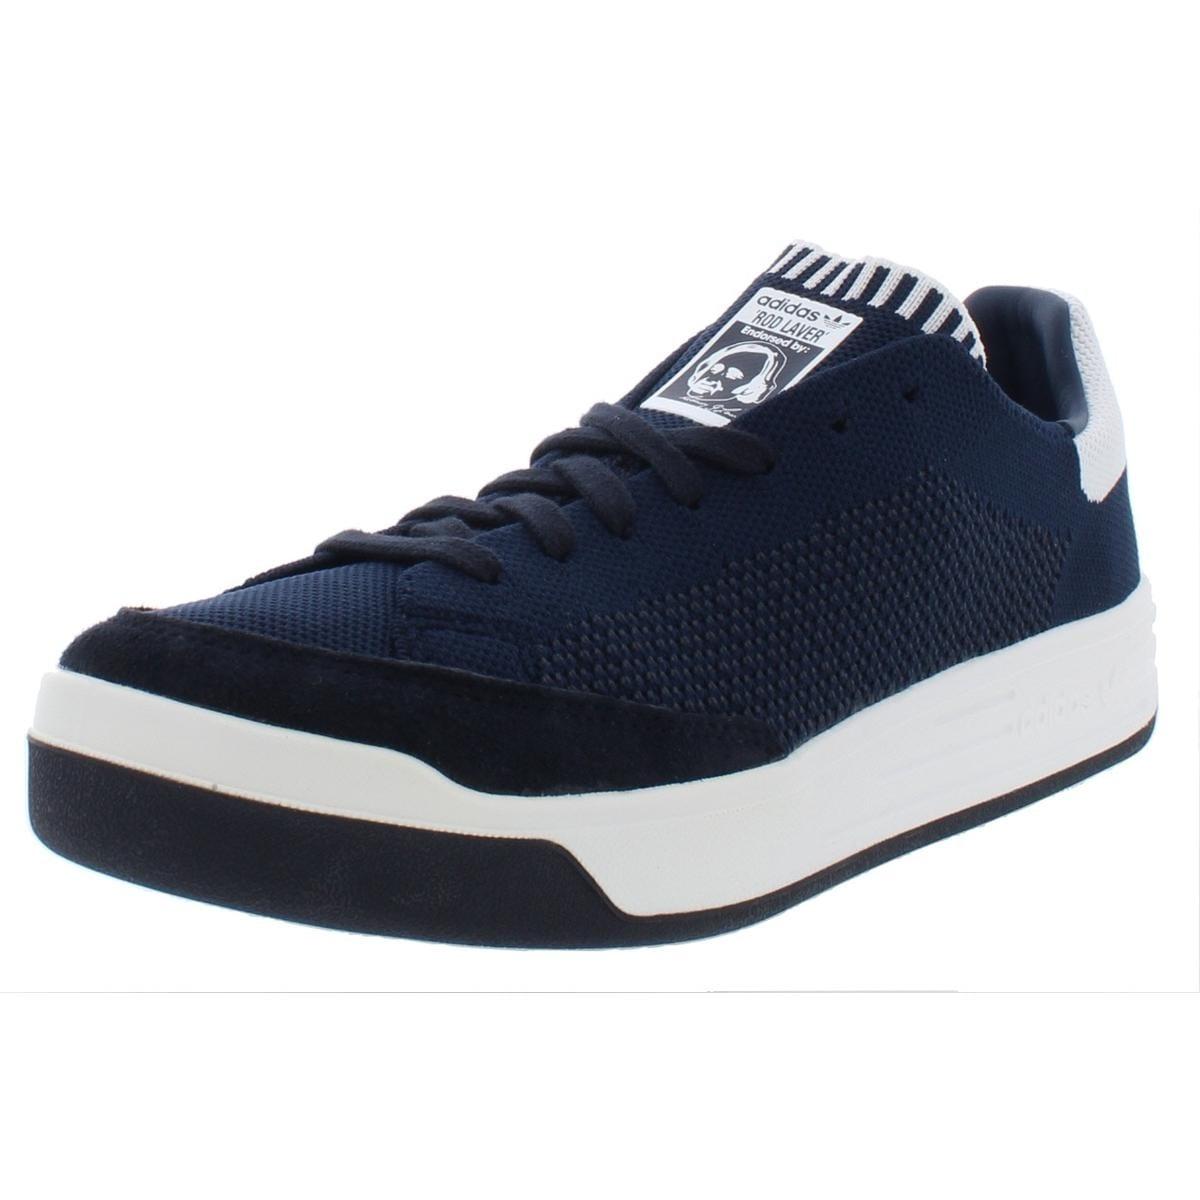 wholesale dealer 0f4da 375e6 adidas Originals Mens Rod Laver Super PK Fashion Sneakers Suede Padded  Insole